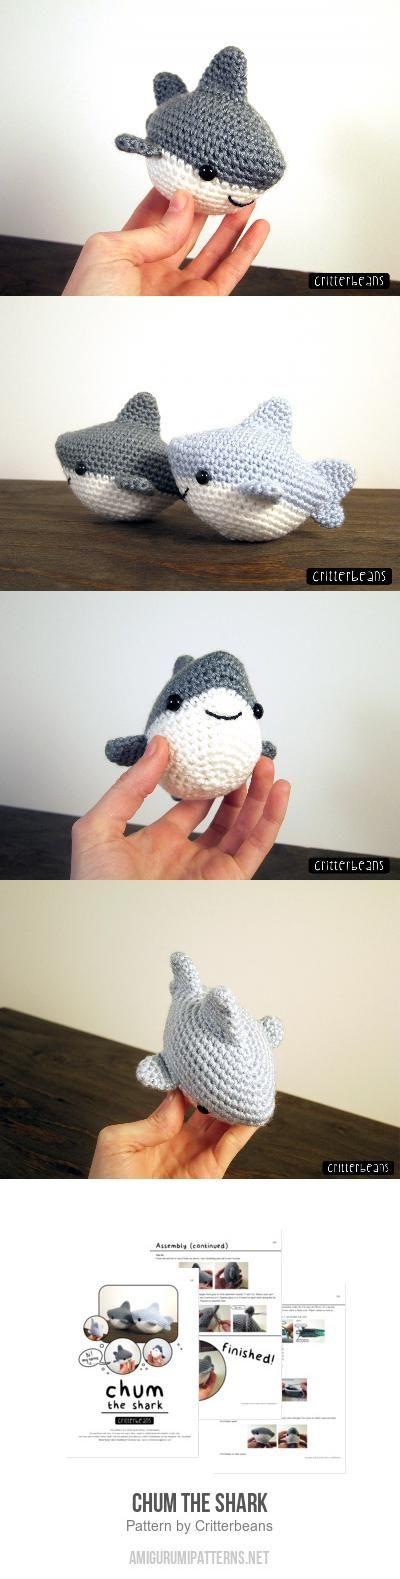 Chum The Shark Amigurumi Pattern By Critterbeans Amigurumi